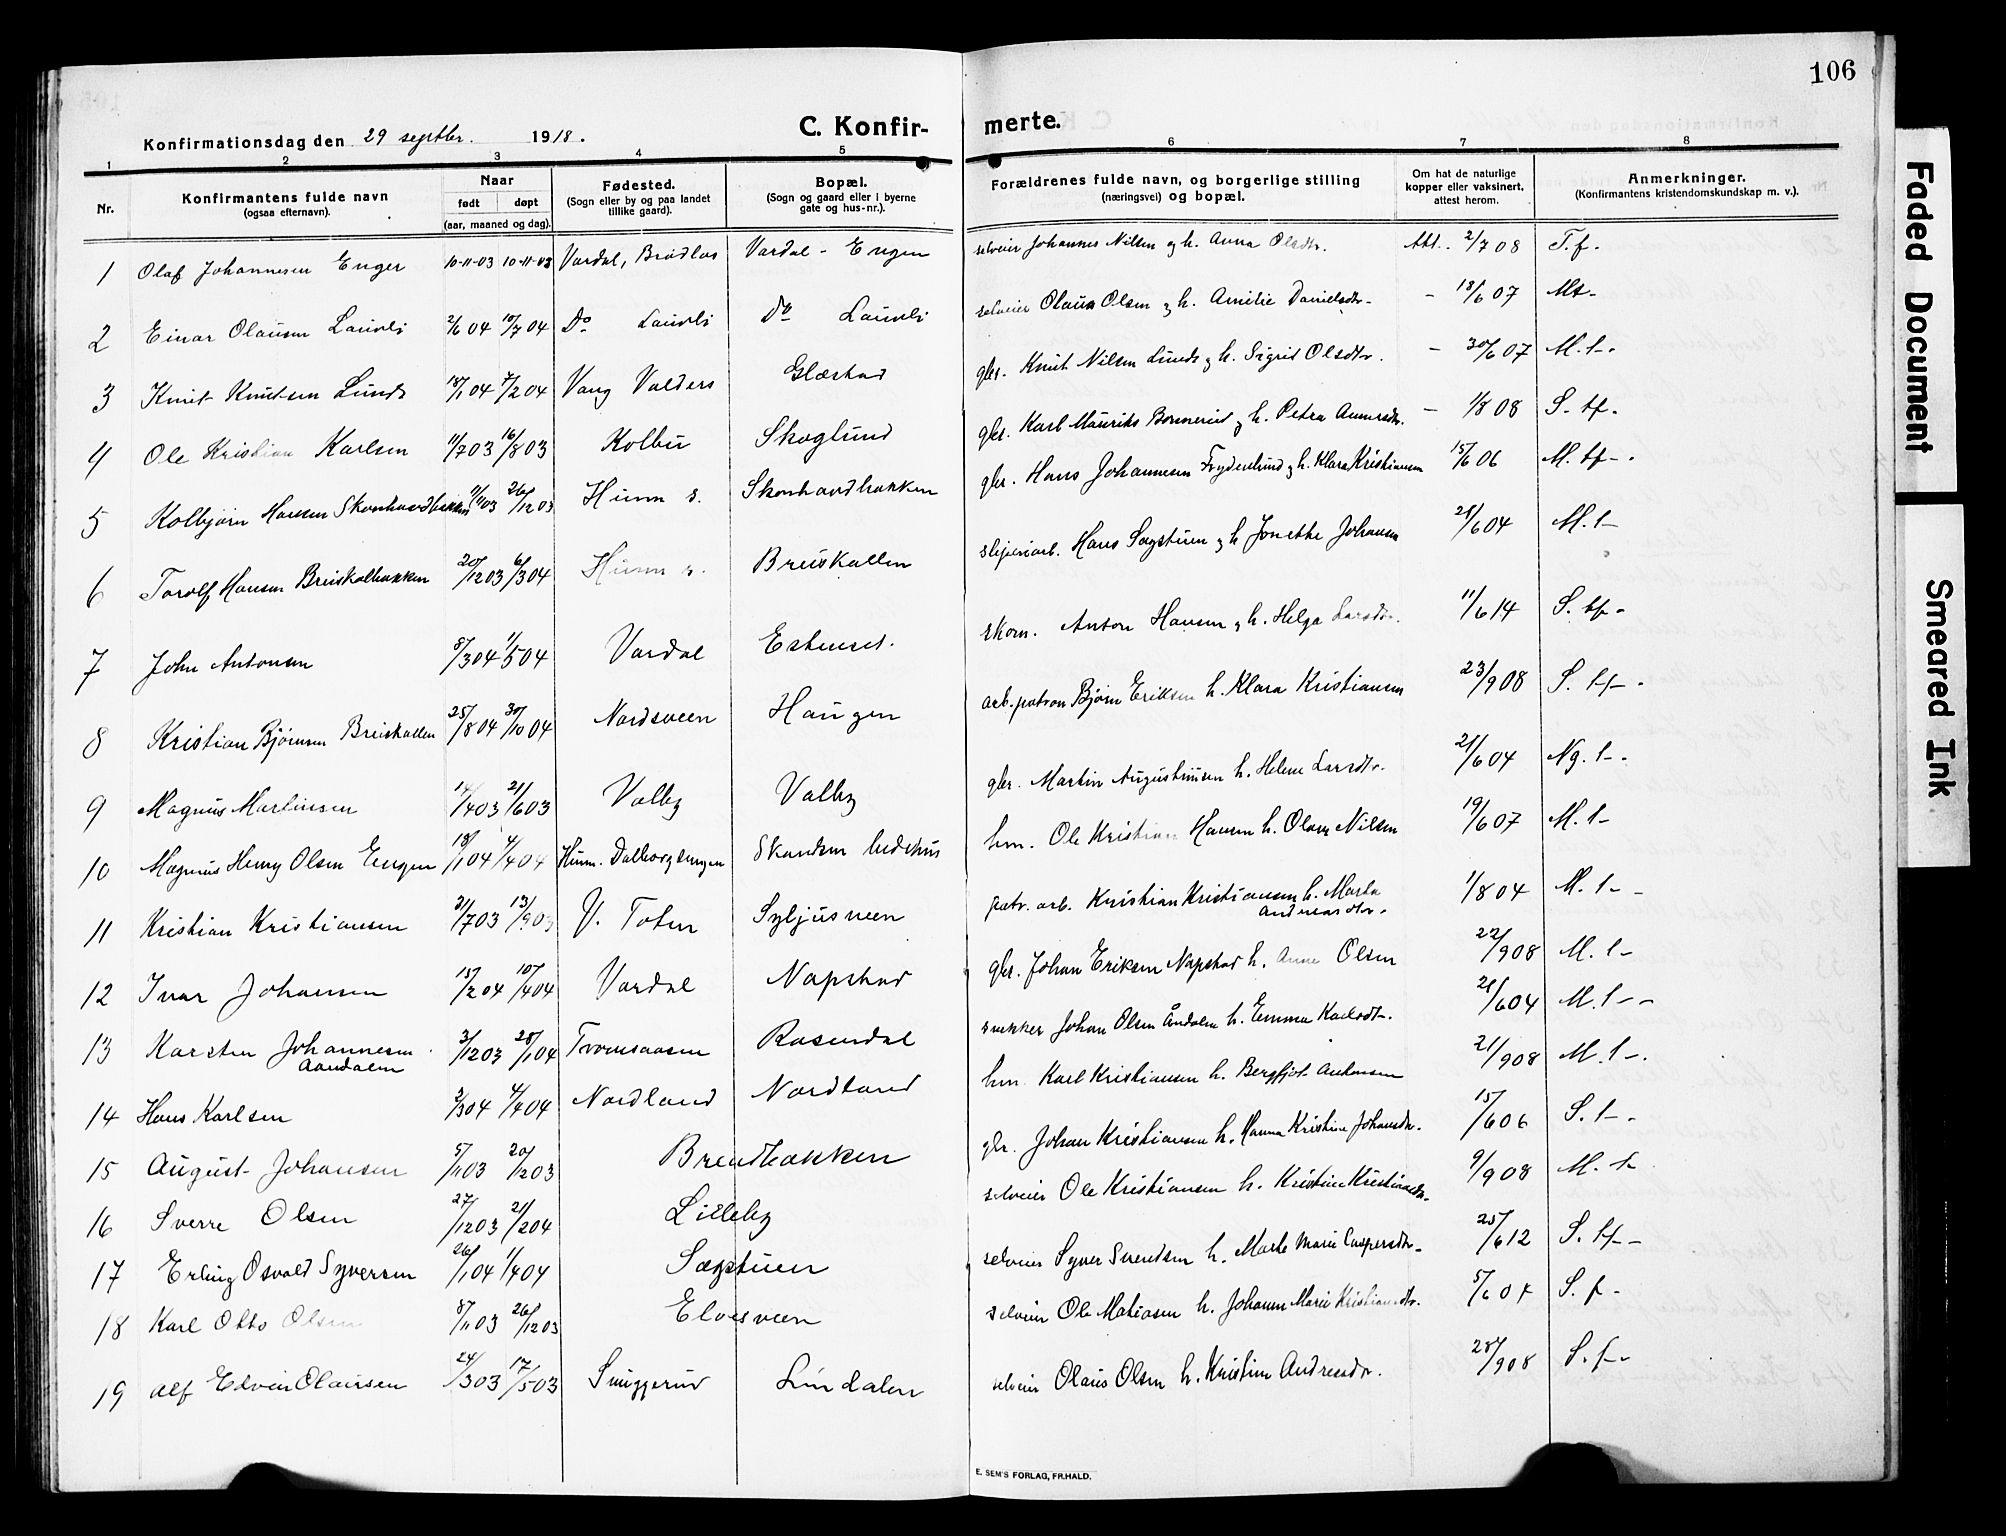 SAH, Vardal prestekontor, H/Ha/Hab/L0015: Klokkerbok nr. 15, 1914-1931, s. 106